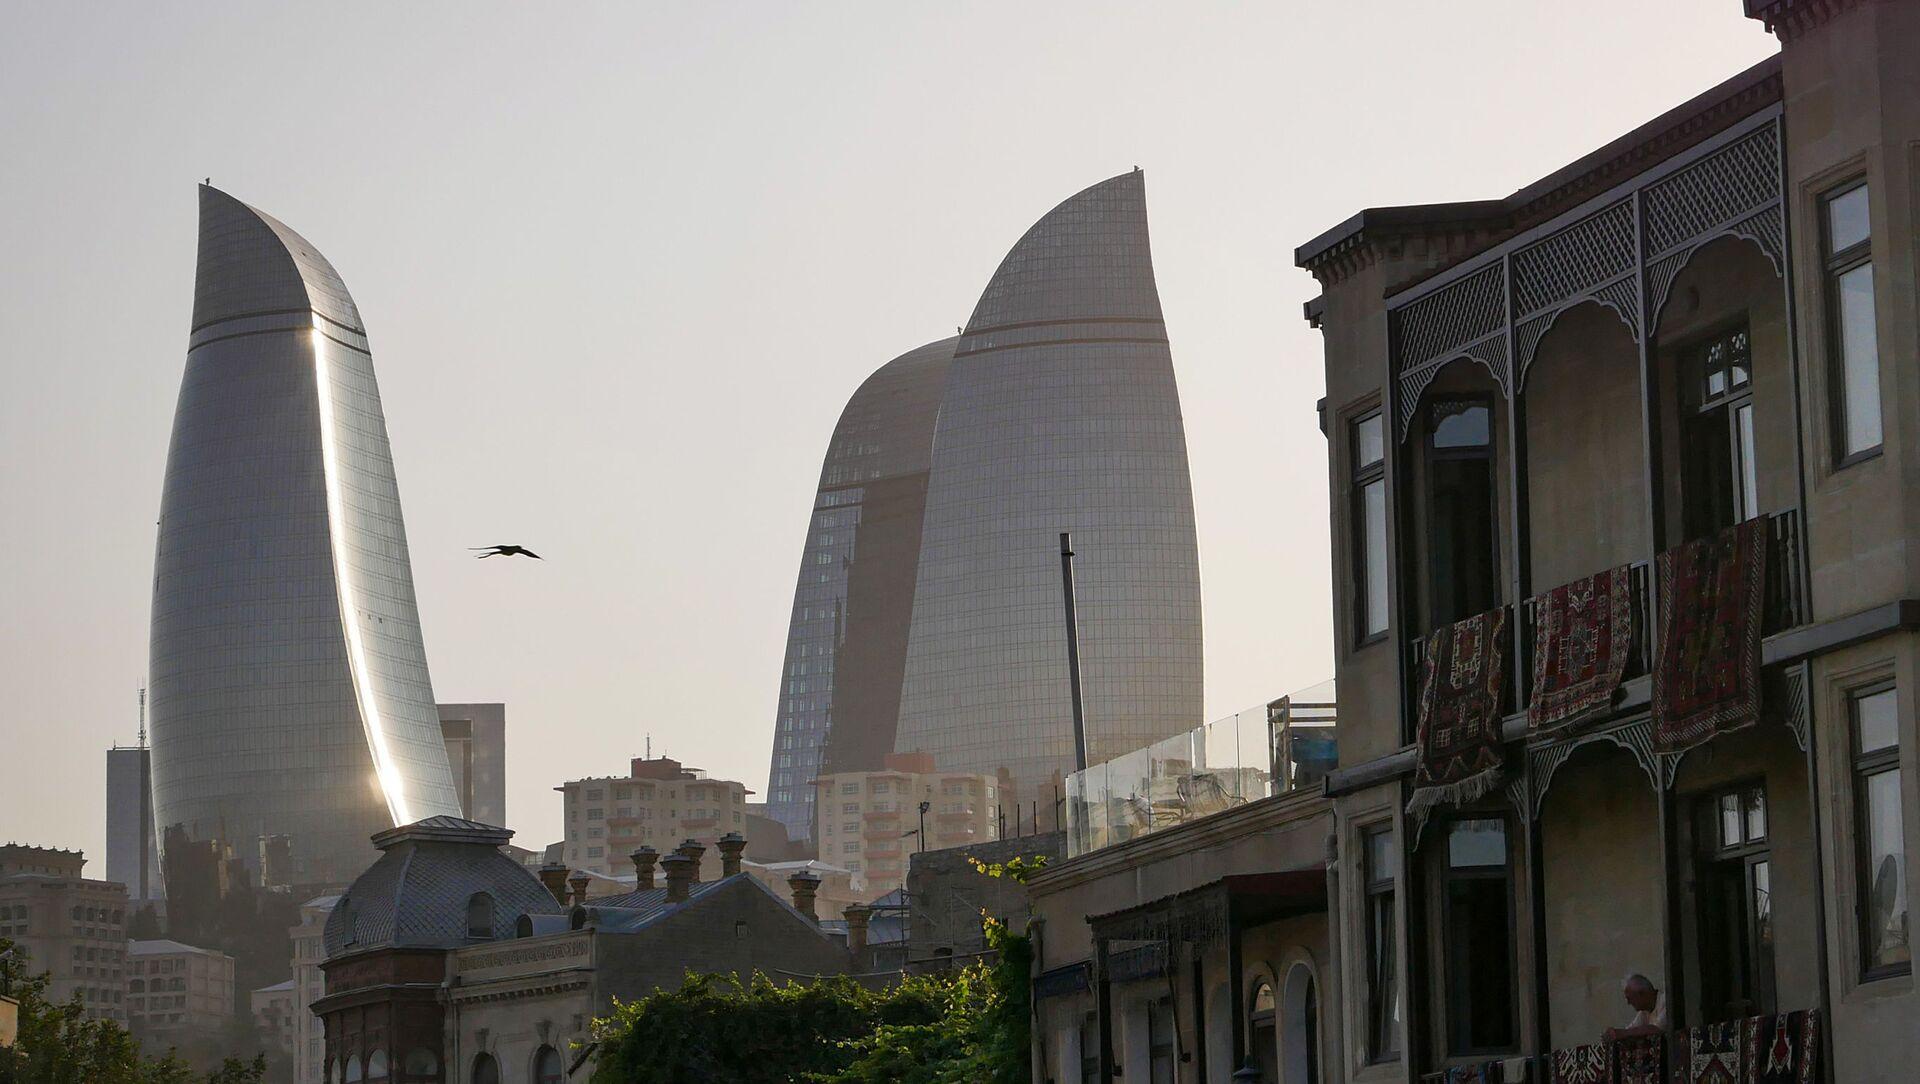 Вид на Пламенные башни (Flame Towers) в Баку, фото из архива - Sputnik Азербайджан, 1920, 25.05.2021